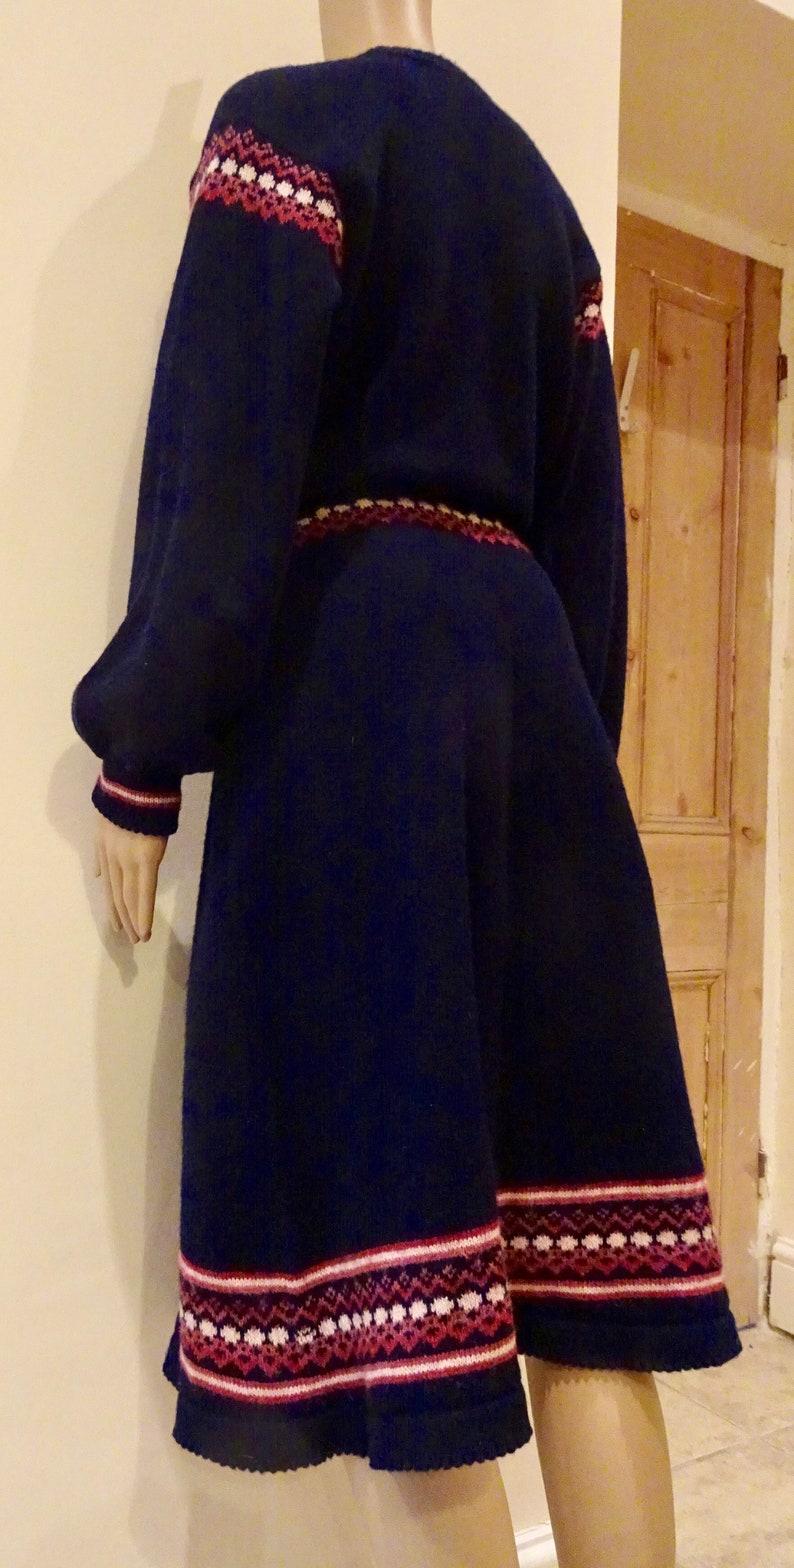 Length 29 BEAUTIFUL Vintage 1940/'s /'Jantzen/' Woollen Jacket Sleeve 23.5 Chest 36